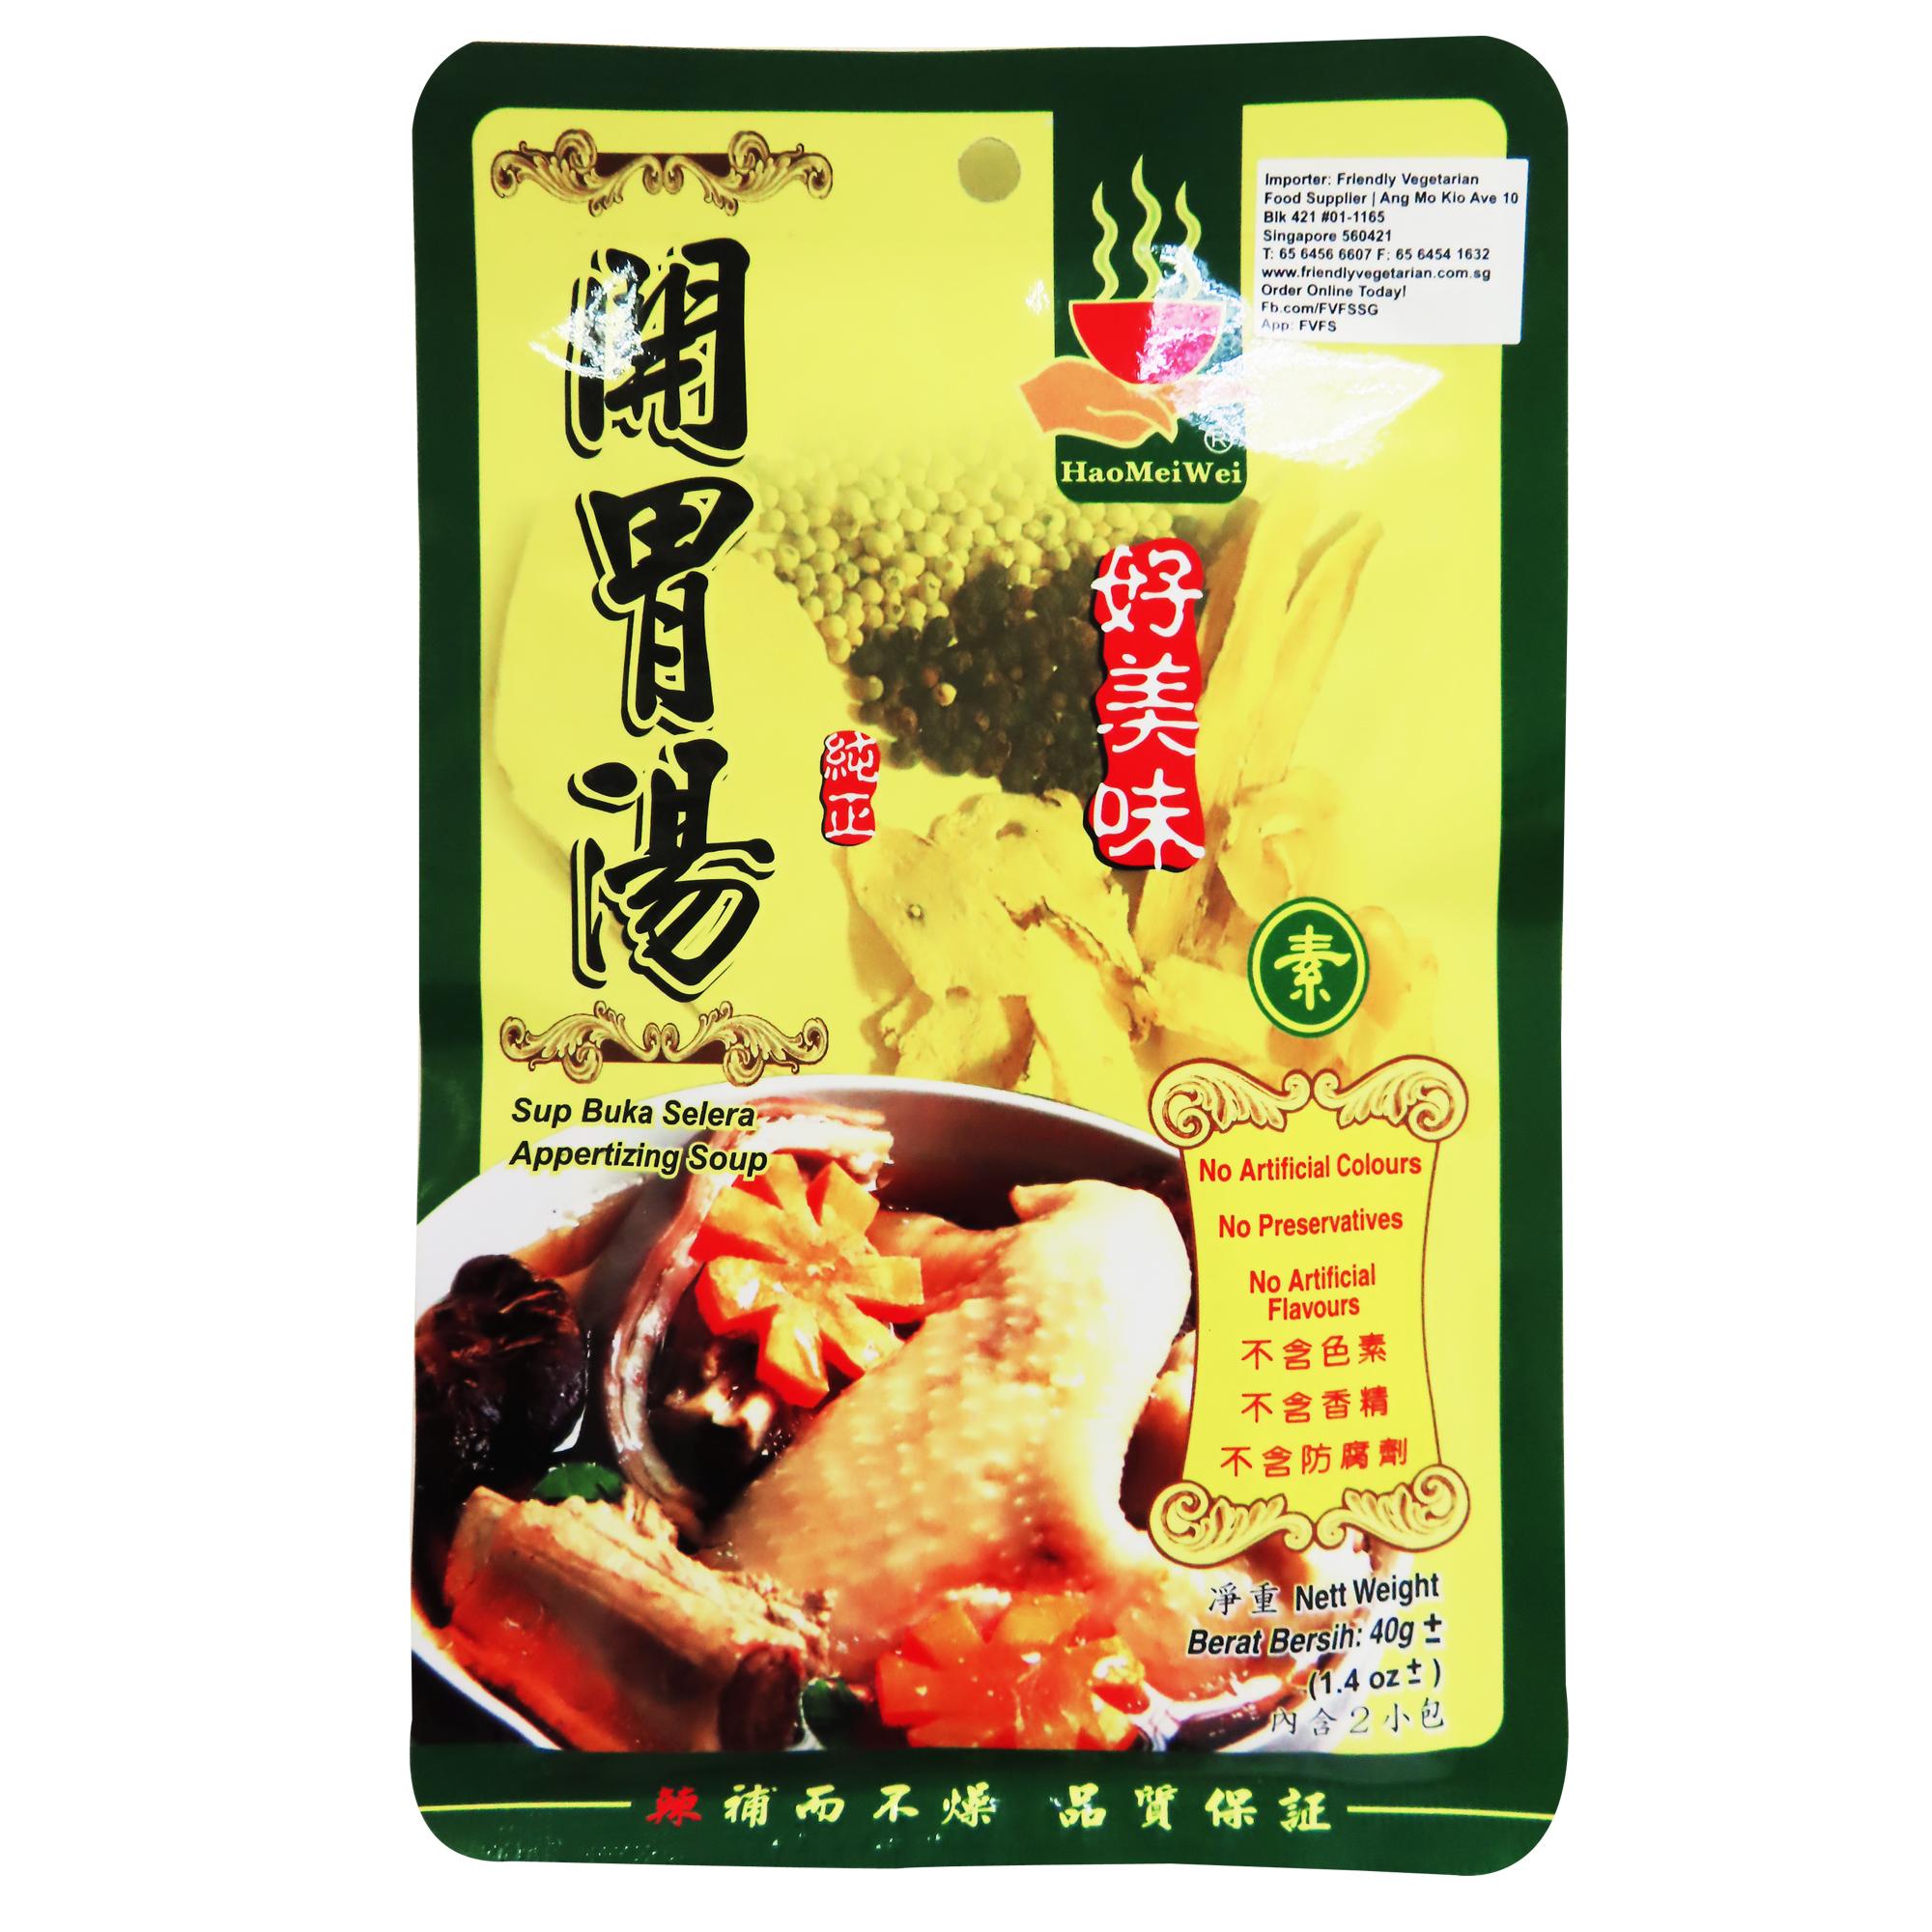 Image Appertizing Soup 好美味 - 开胃汤包 40grams